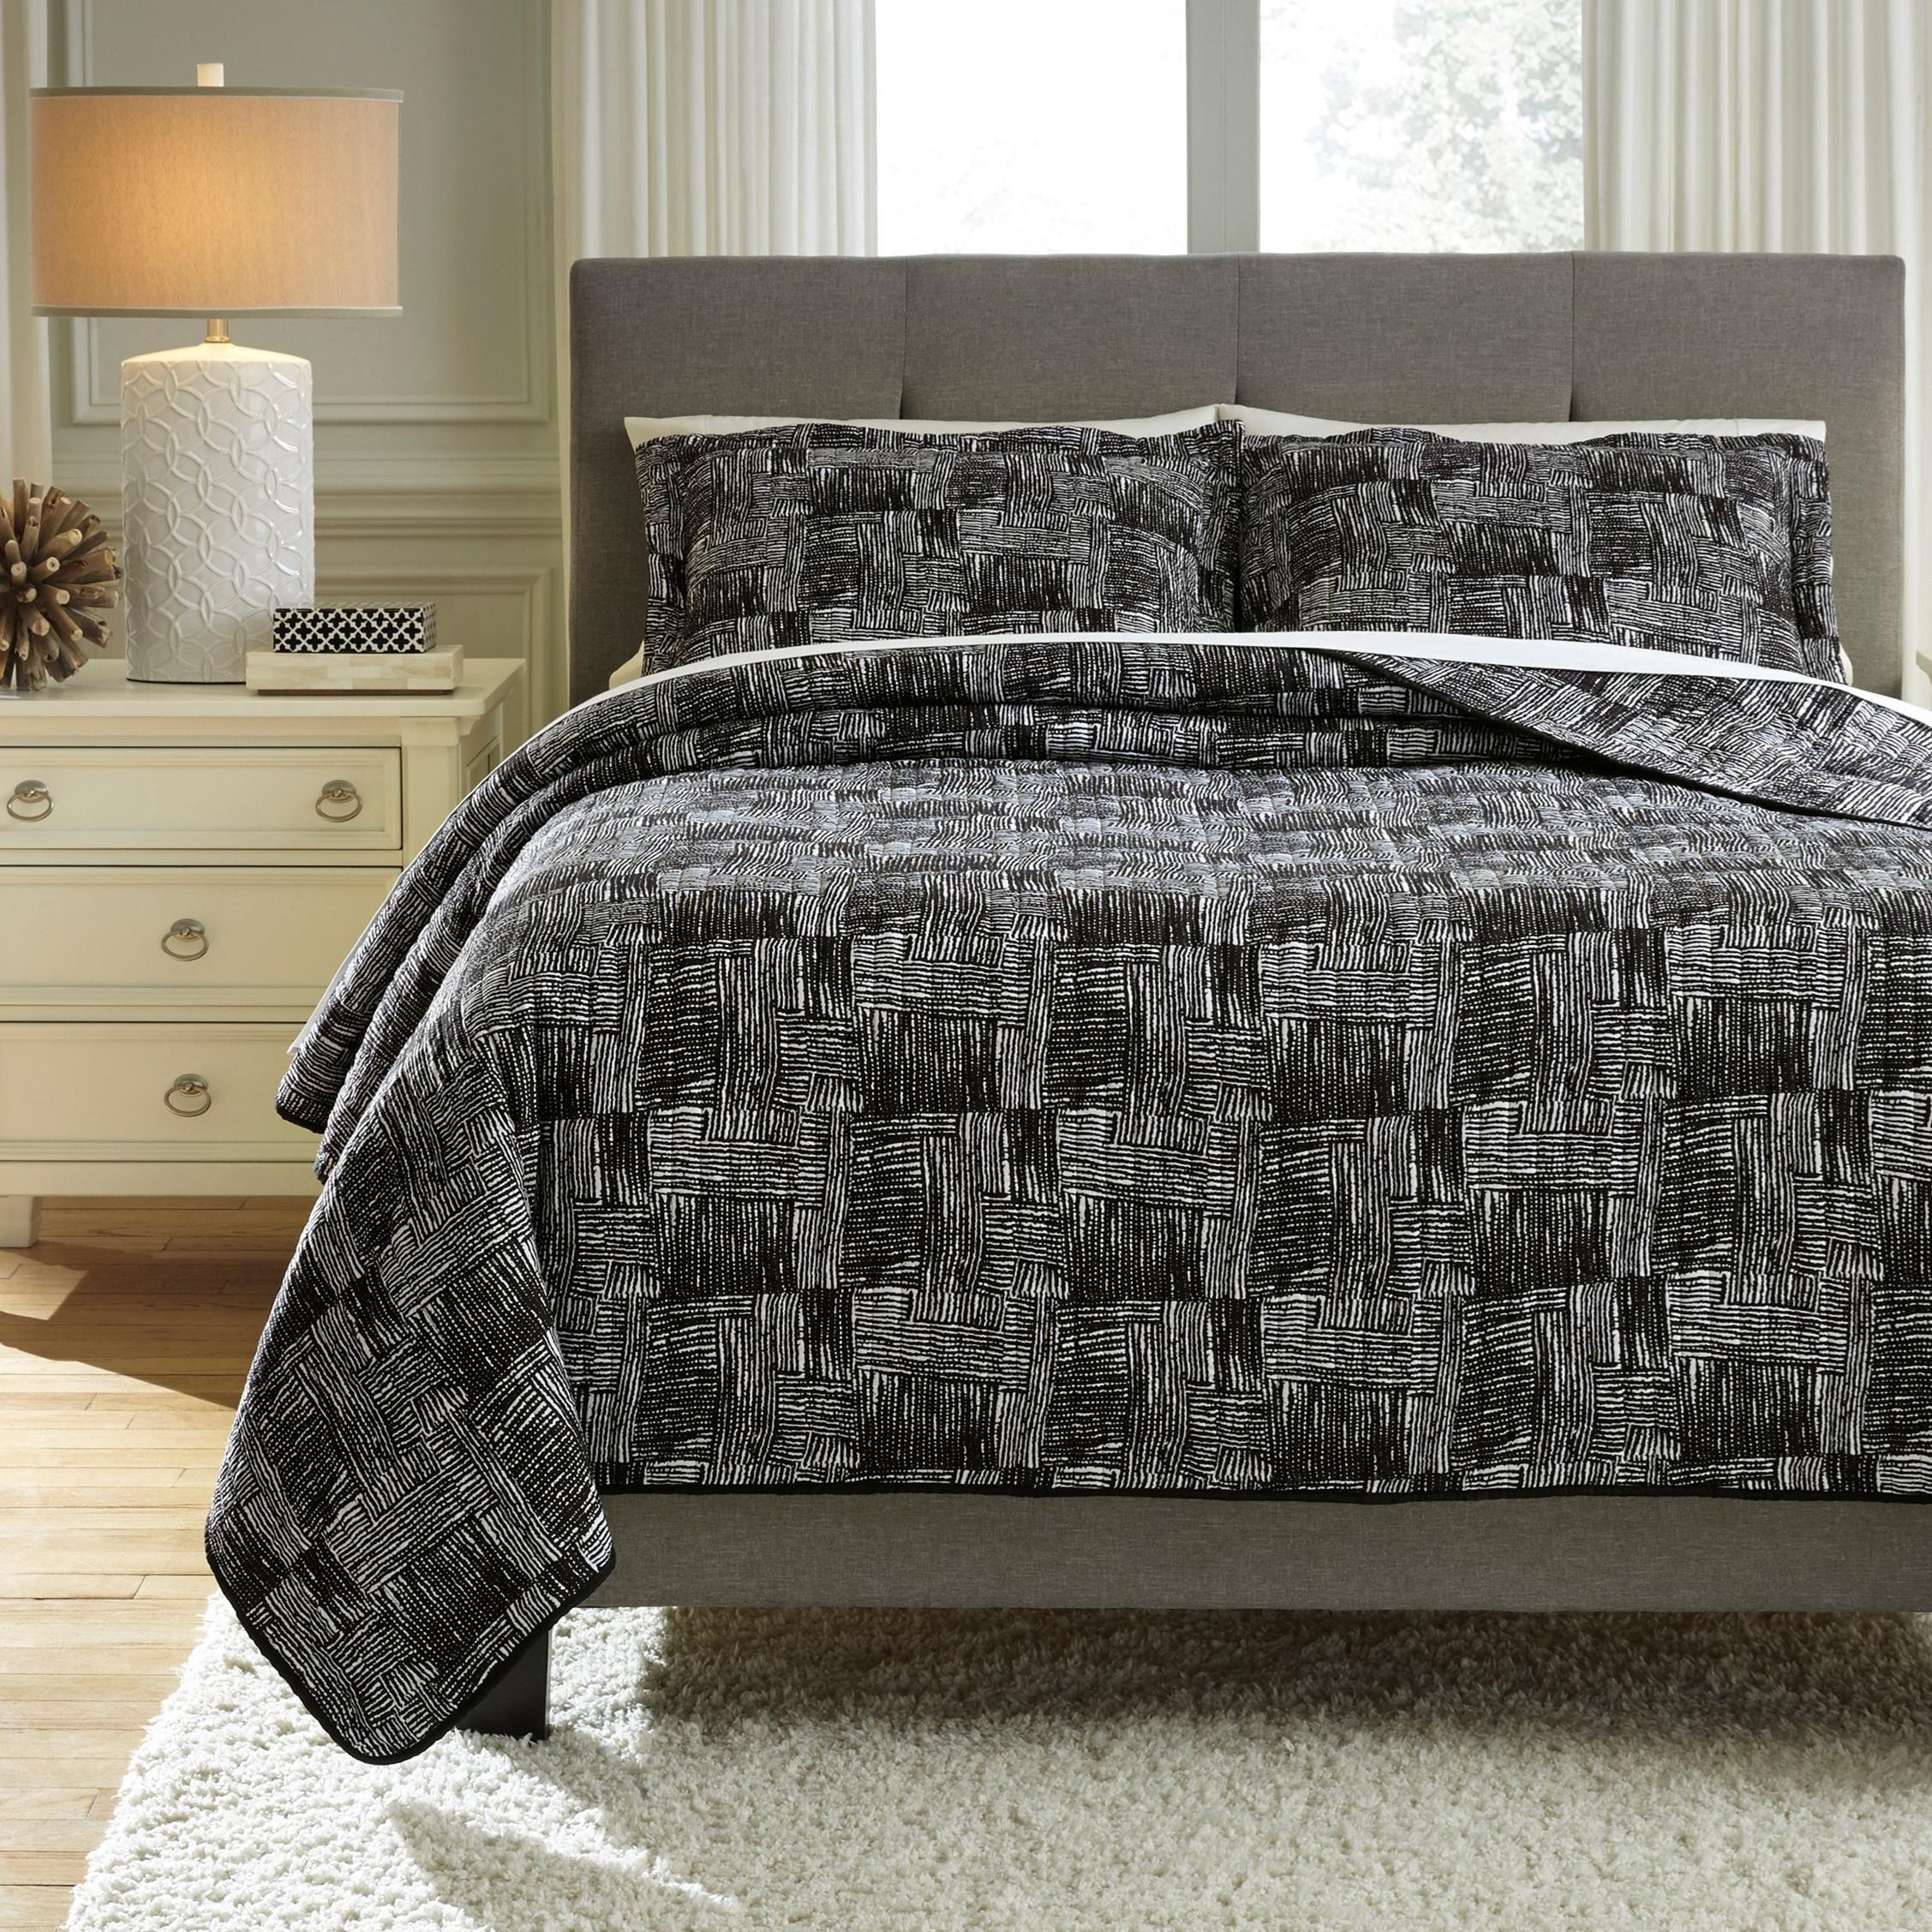 Bedding Sets Queen Jabesh Black Quilt Set by Signature Design by Ashley at Sam Levitz Furniture